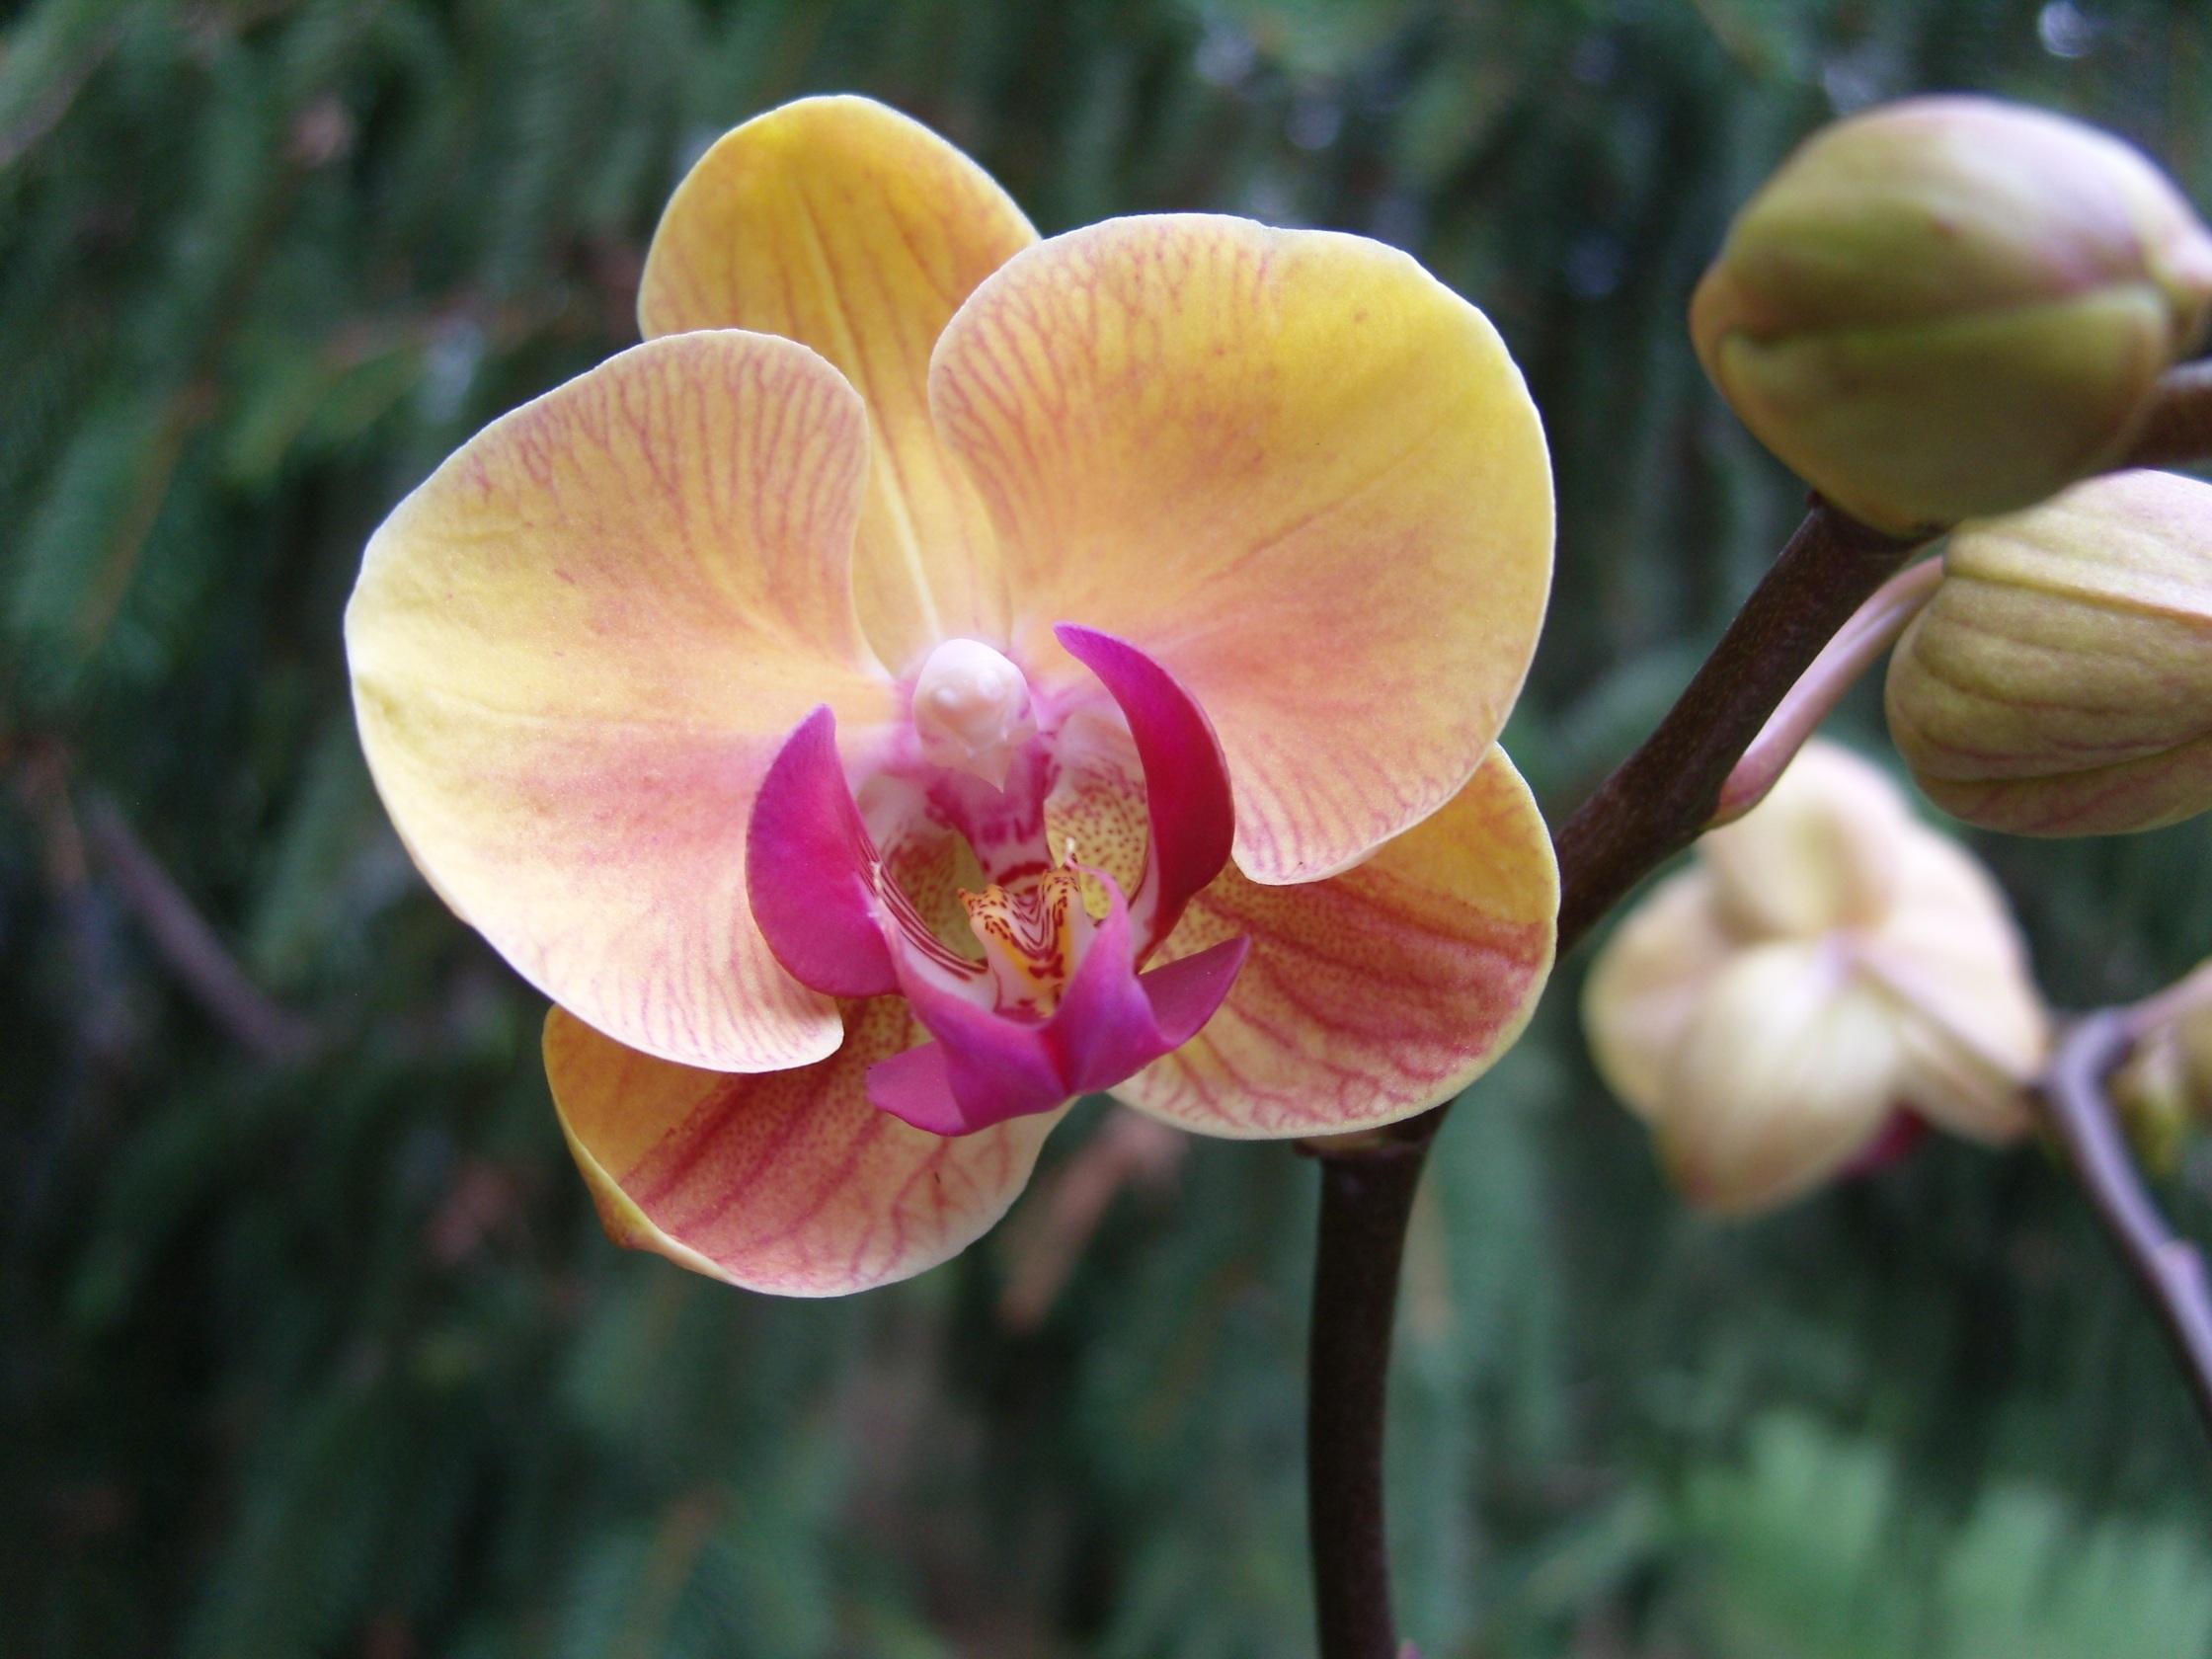 Free Images Blossom Flower Petal Botany Flora Wildflower